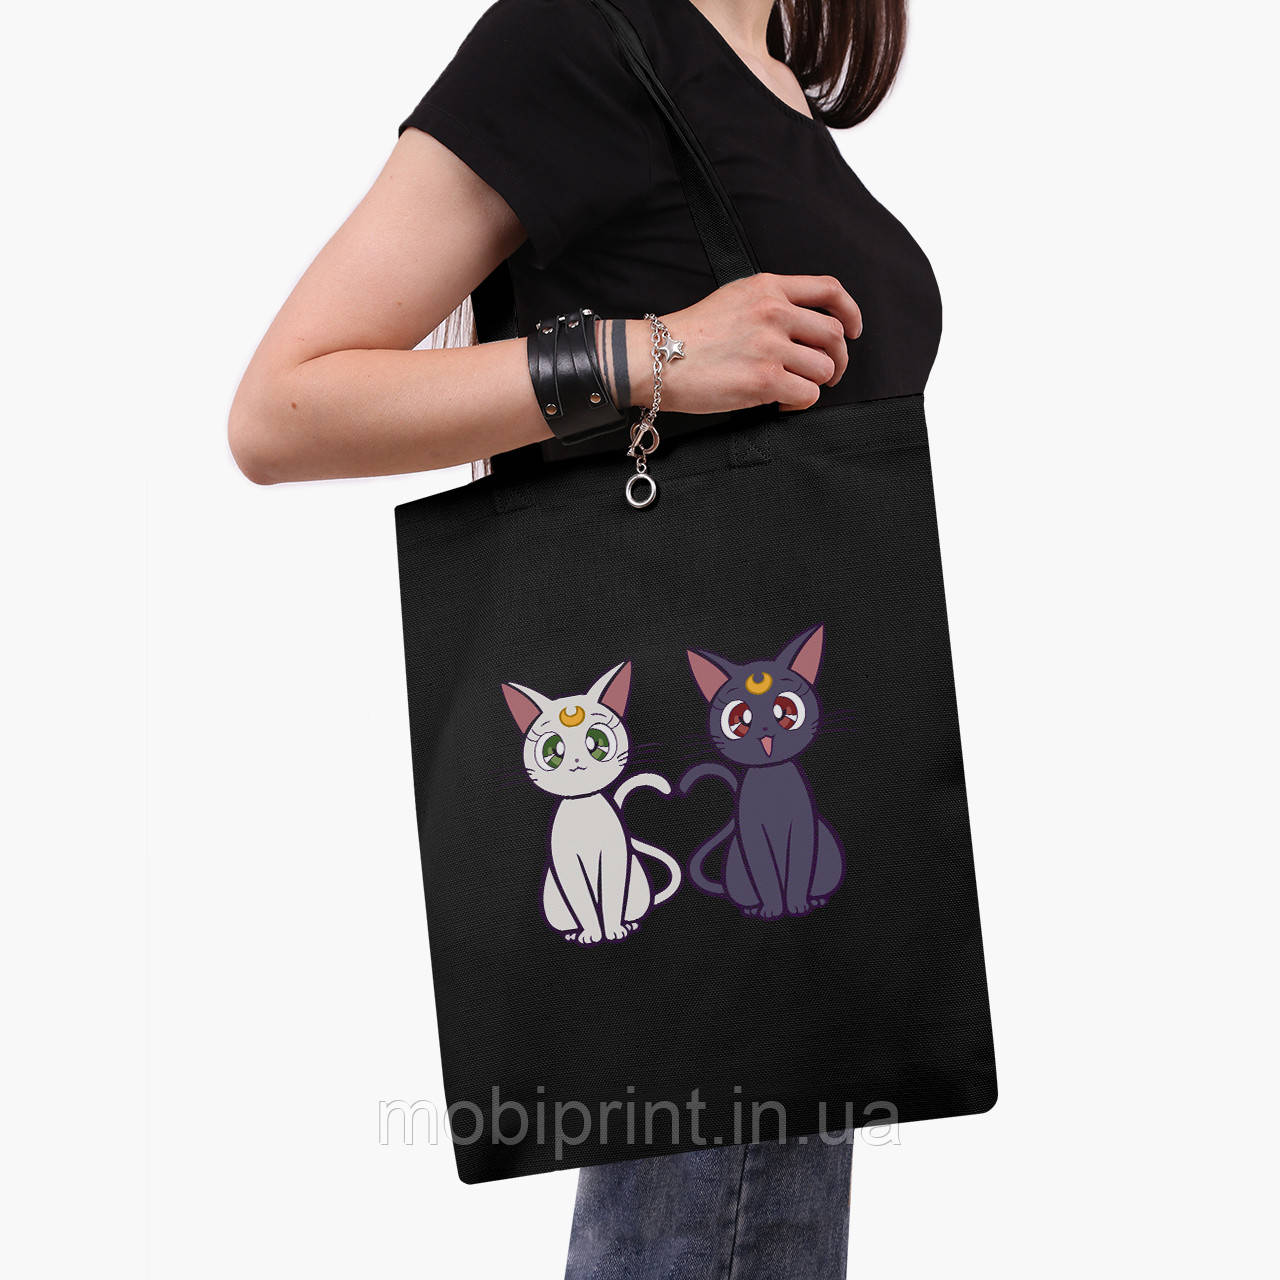 Эко сумка шоппер черная Луна Кошки Сейлор Мун (anime Sailor Moon Cats) (9227-2849-2)  41*35 см